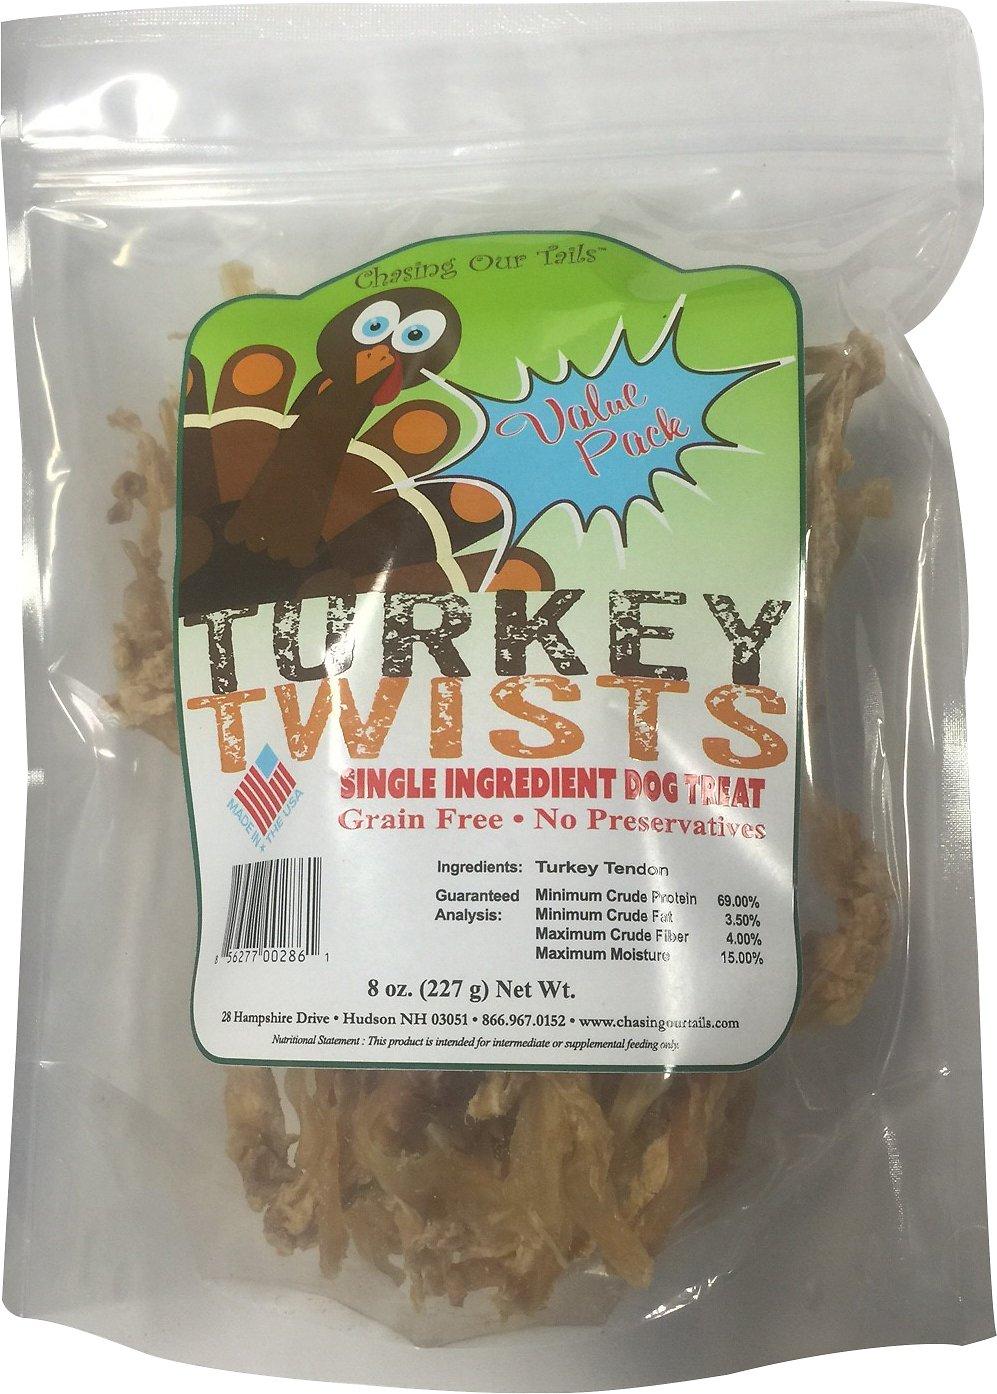 Chasing Our Tails Turkey Twists Single Ingredient Turkey Tendon Dog Treats, 8-oz bag